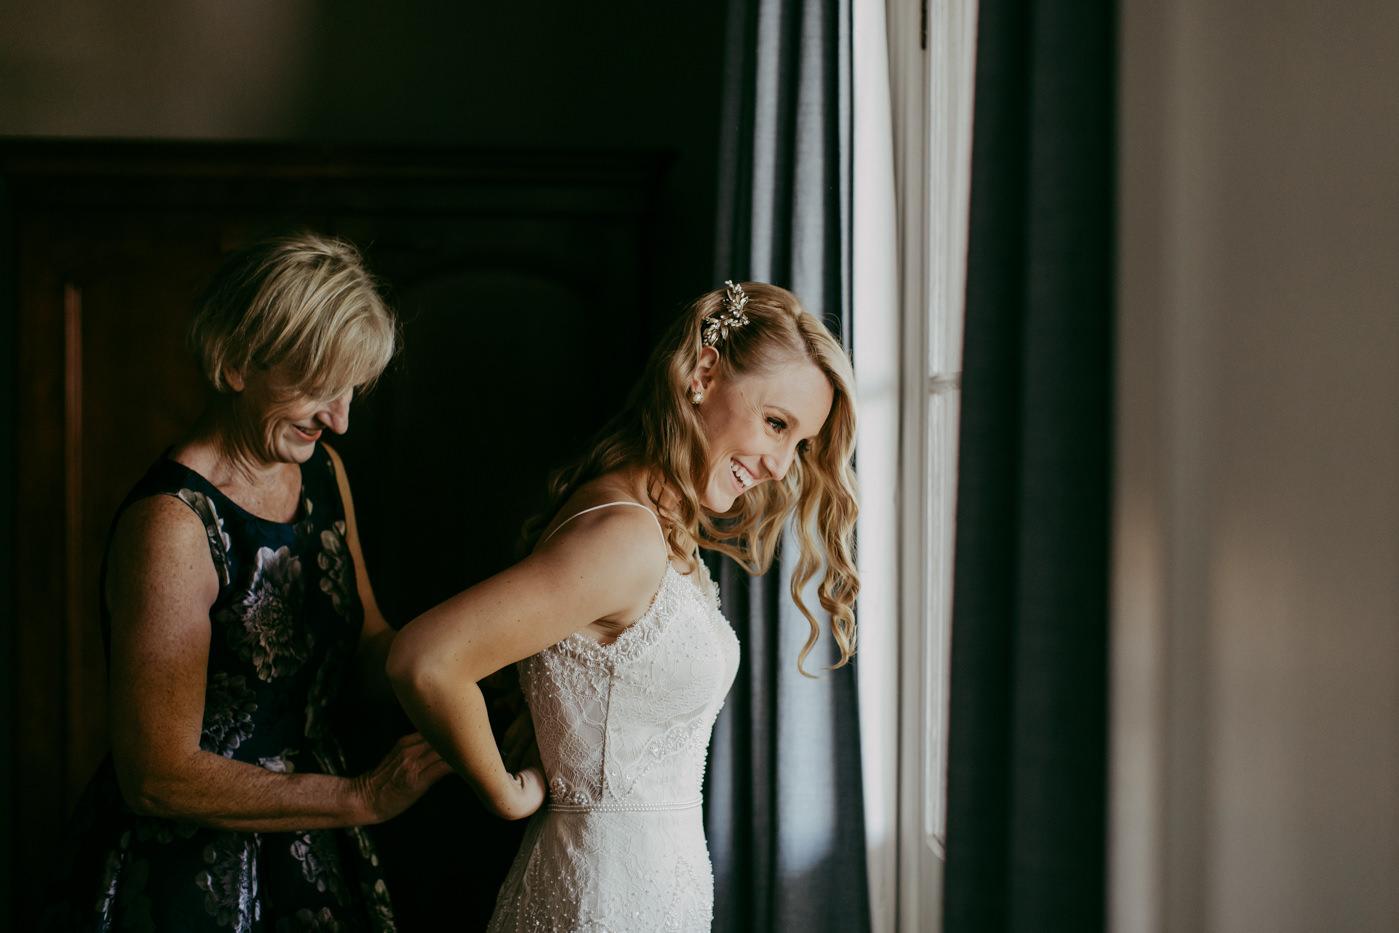 Anthony & Eliet - Wagga Wagga Wedding - Country NSW - Samantha Heather Photography-21.jpg